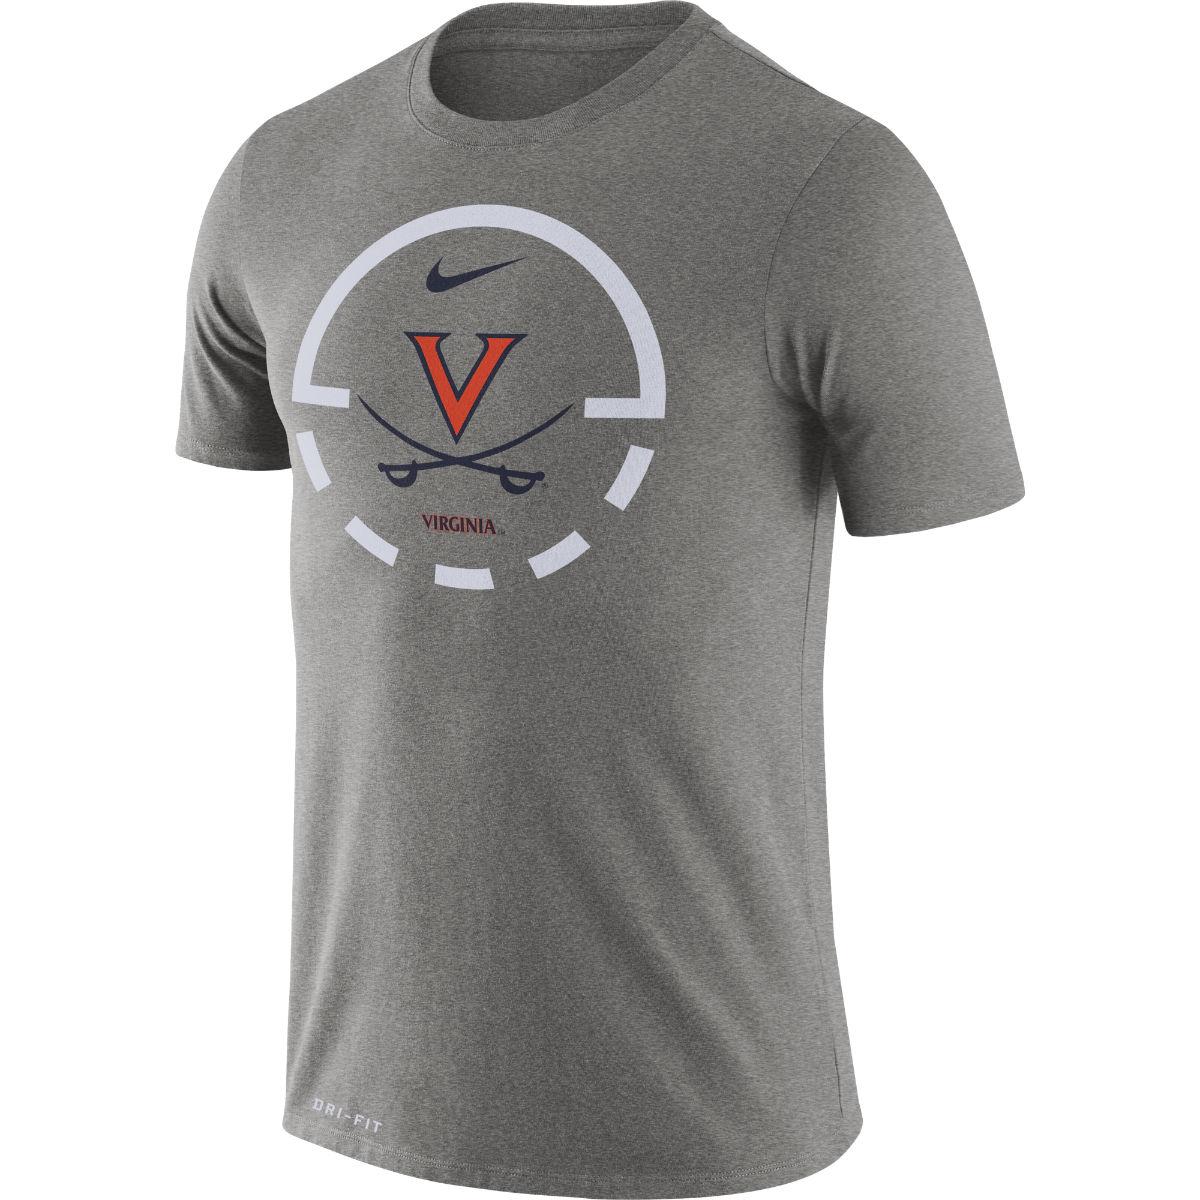 Virginia Basketball Foul Line T-shirt